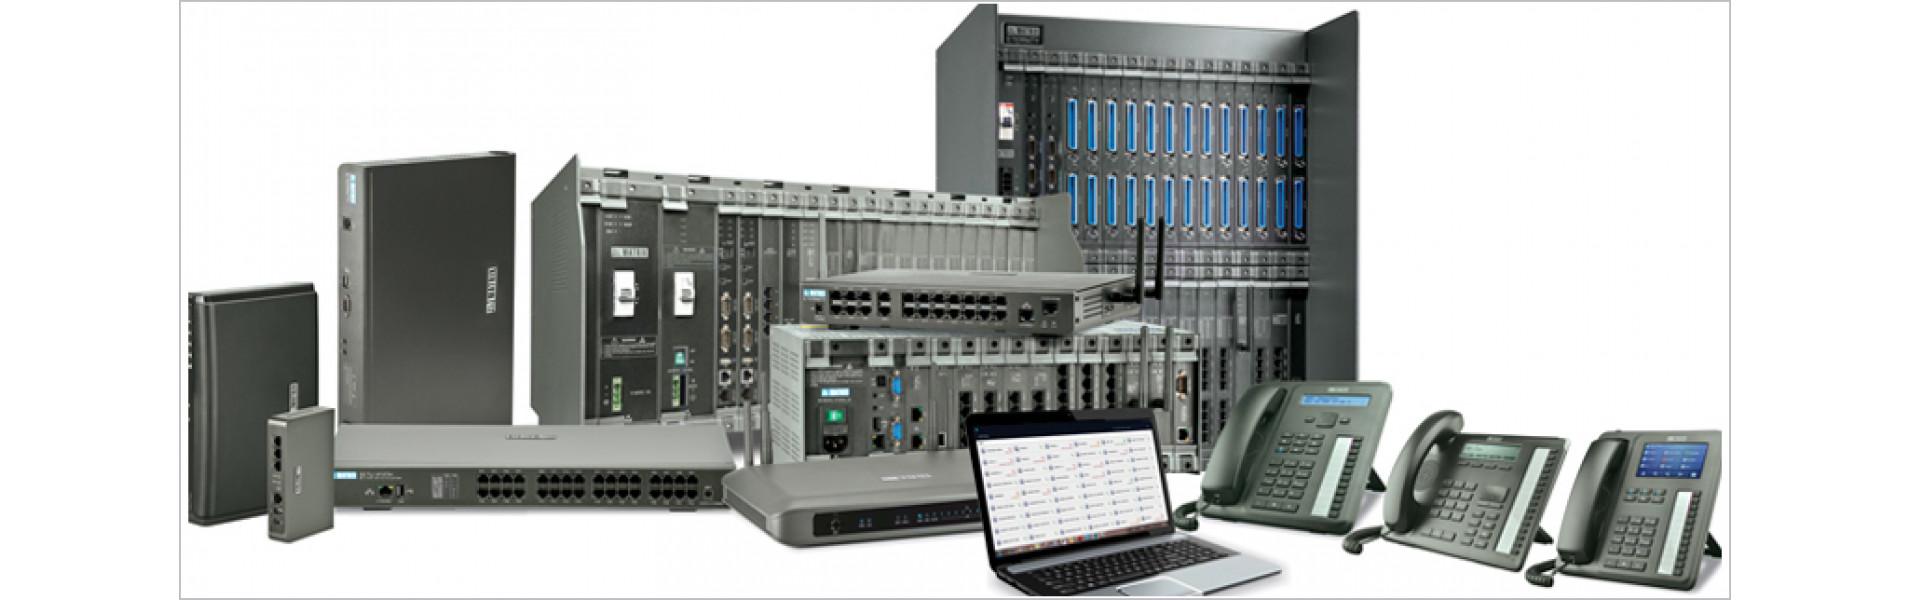 Продажа, установка, обслуживание IP АТС и Цифровых Мини-АТС